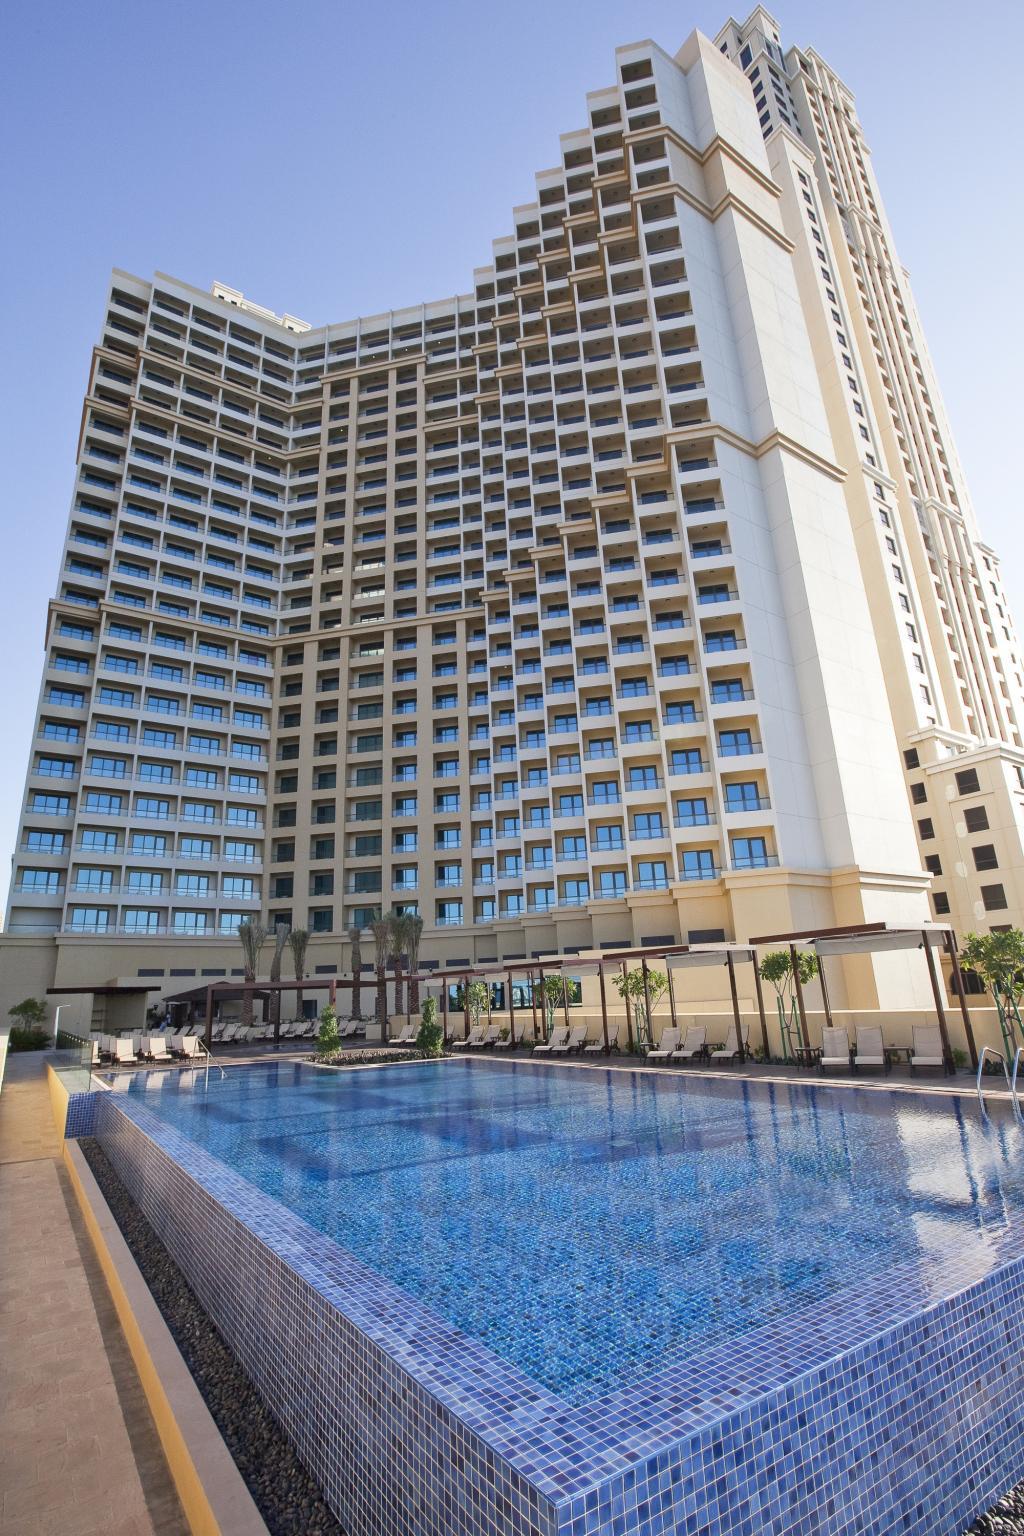 © JA Ocean View Hotel | Dubai